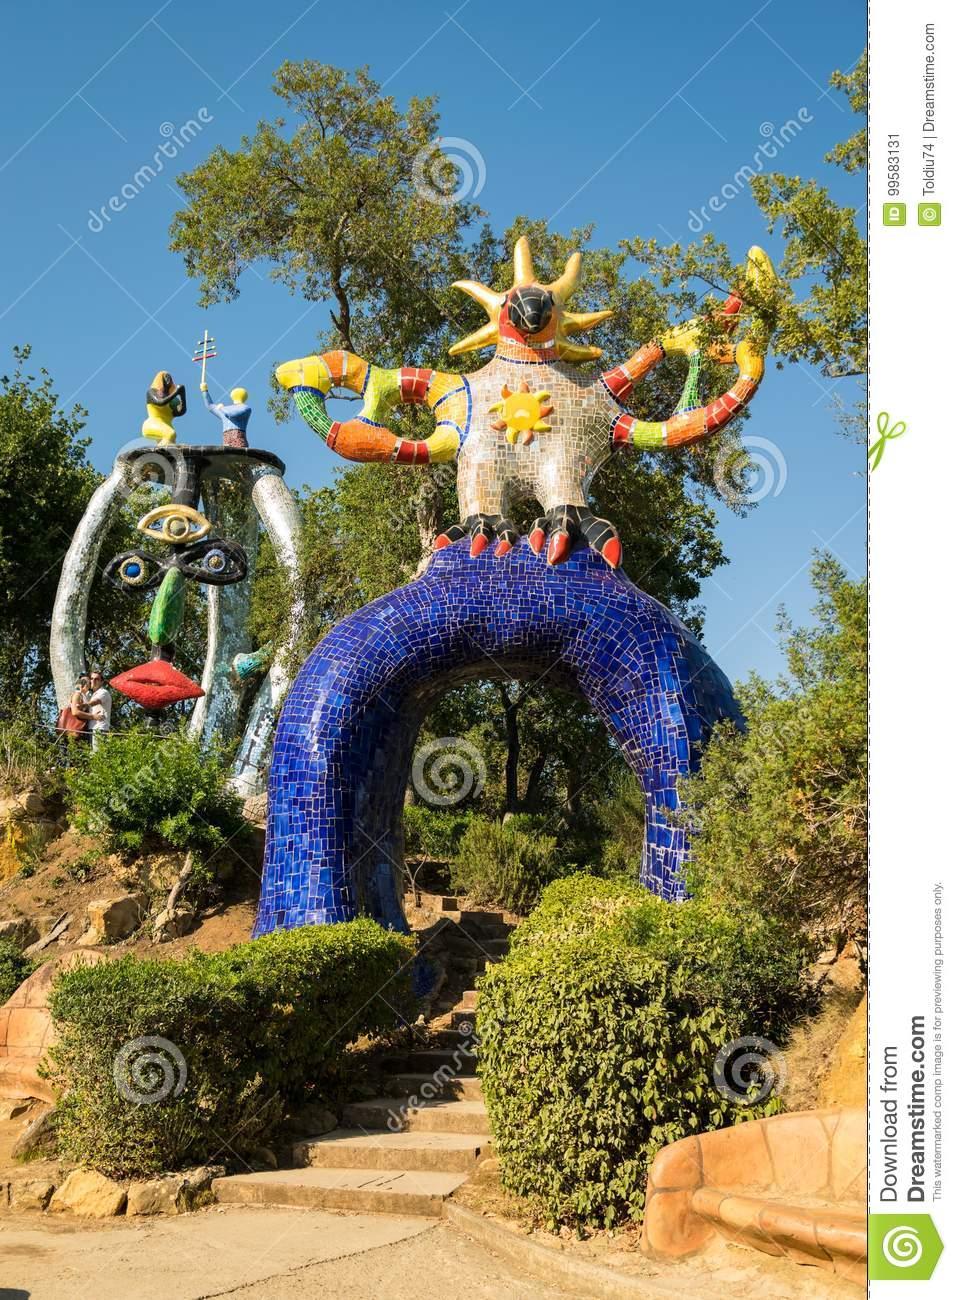 pescia fiorentina italy june tarot garden sculpture based esoteric created french artist niki de saint phalle tar